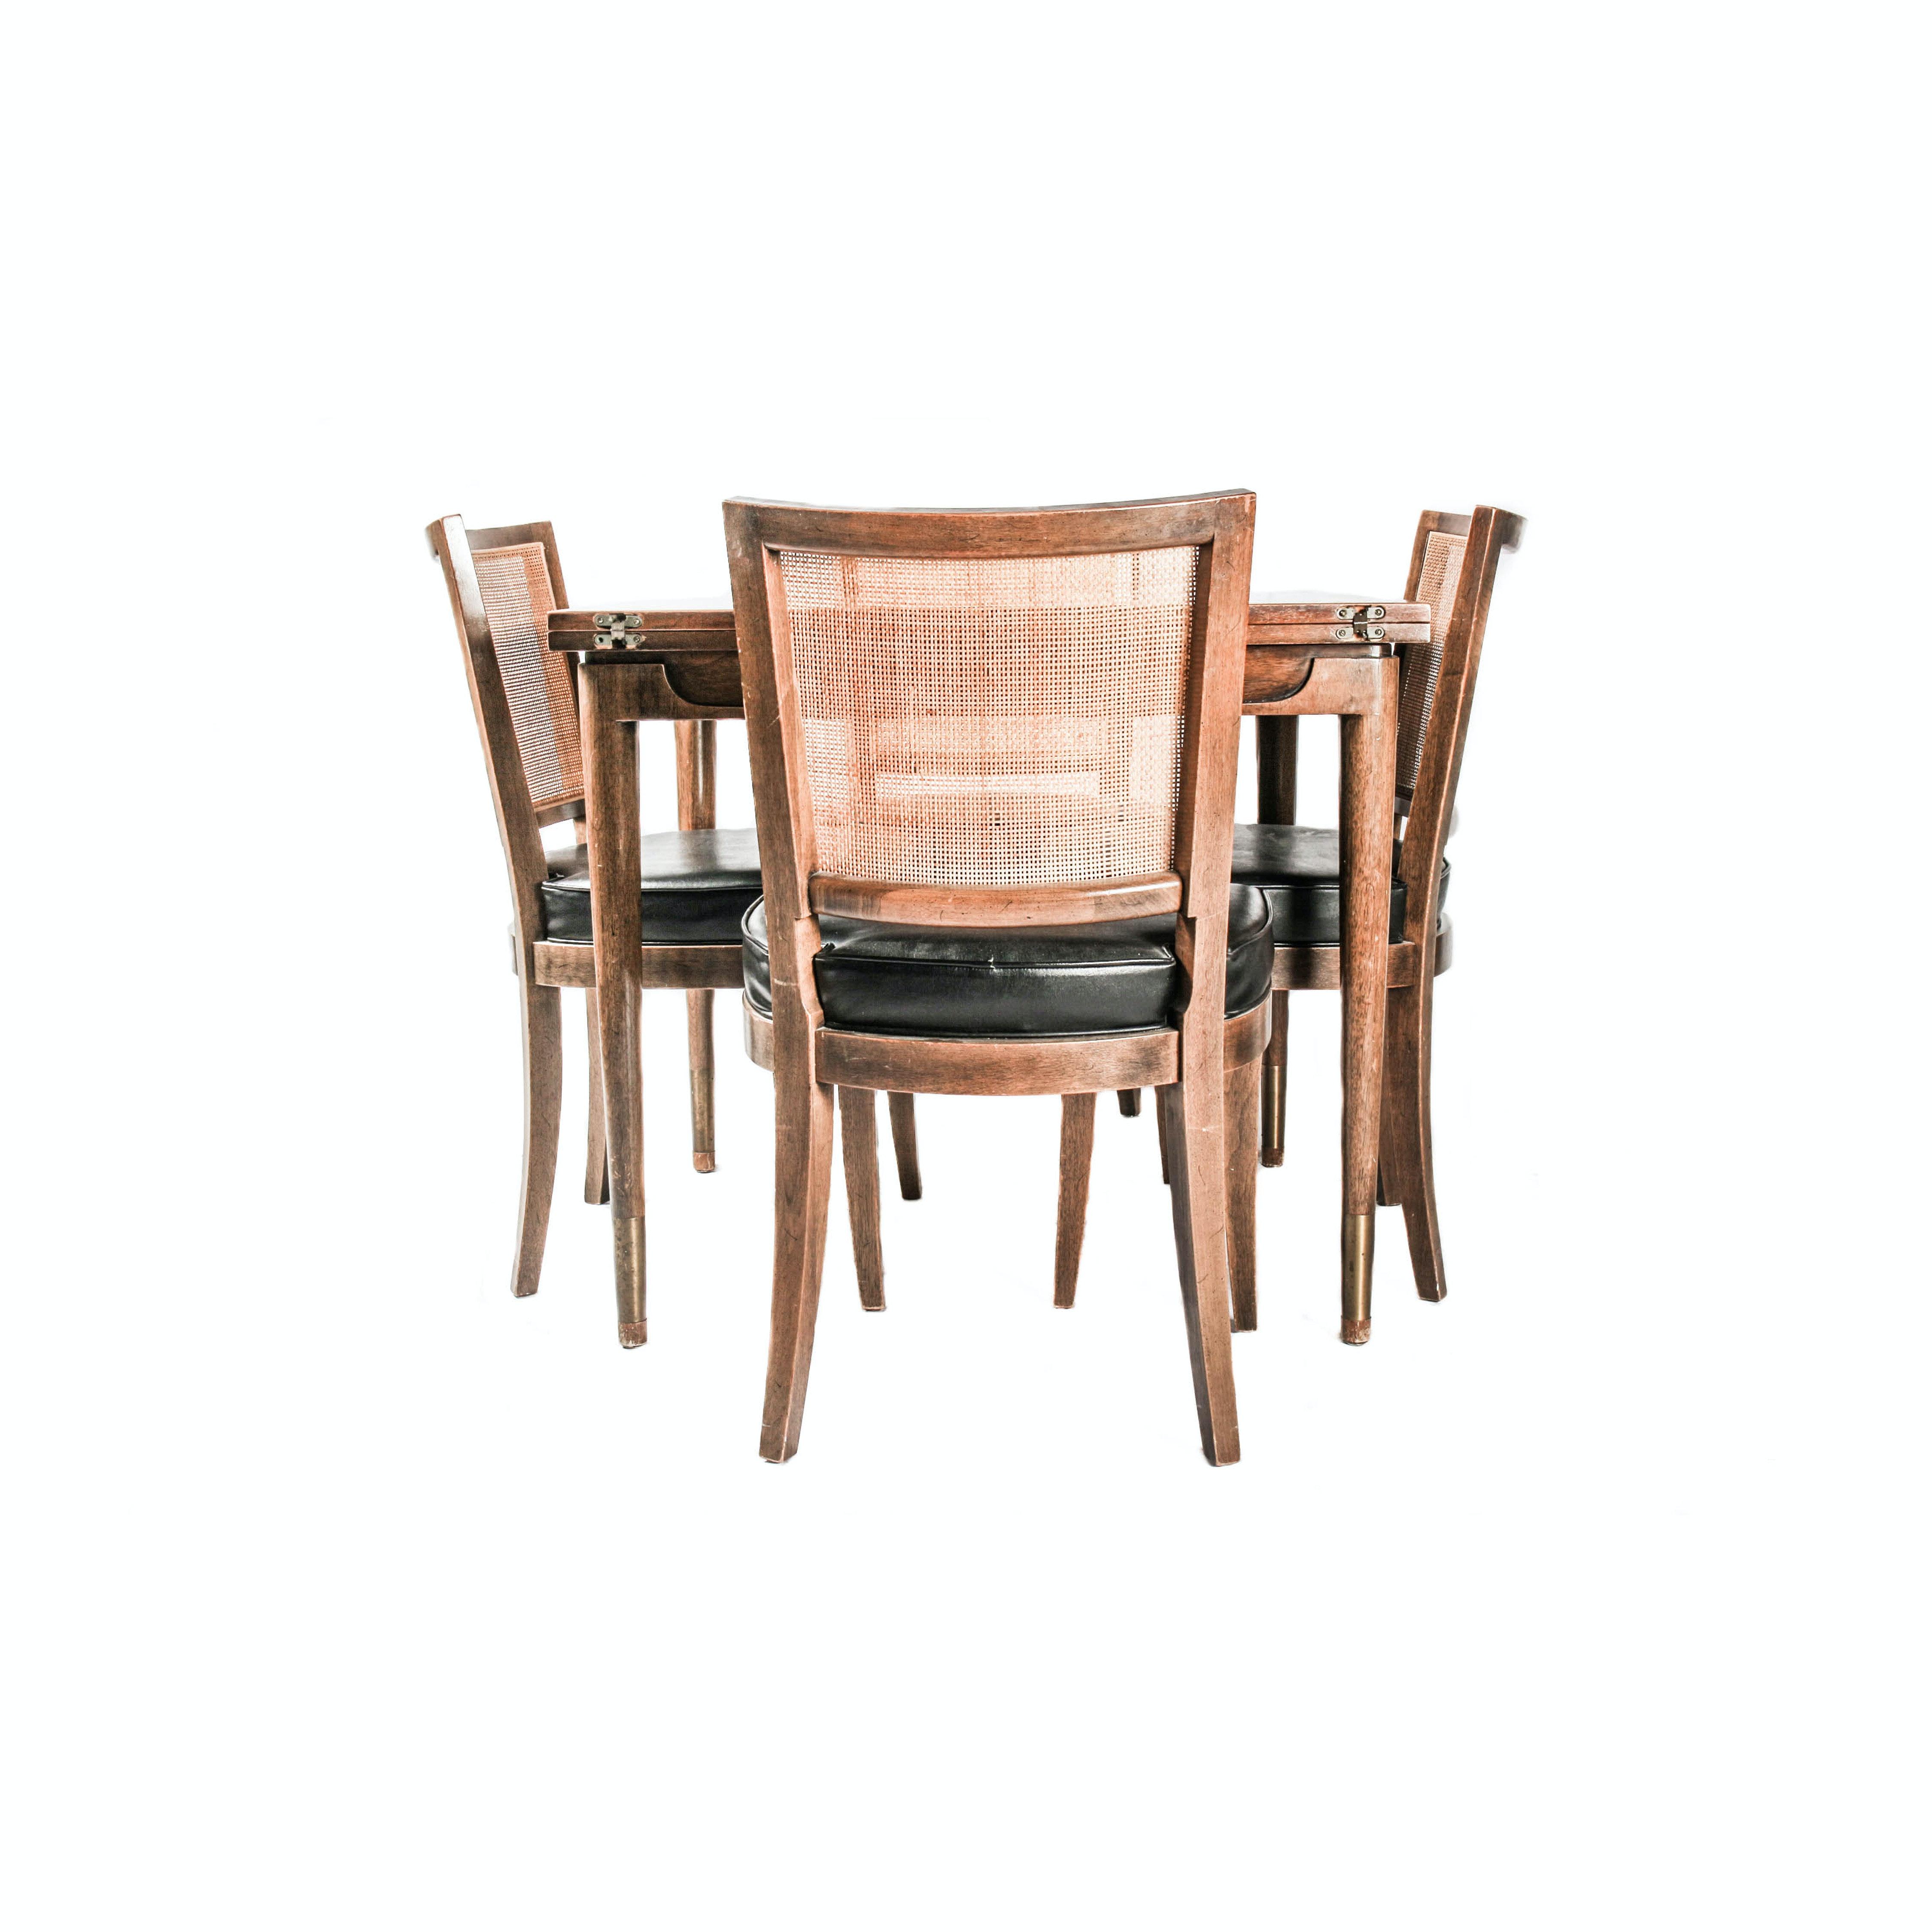 Matching dining room